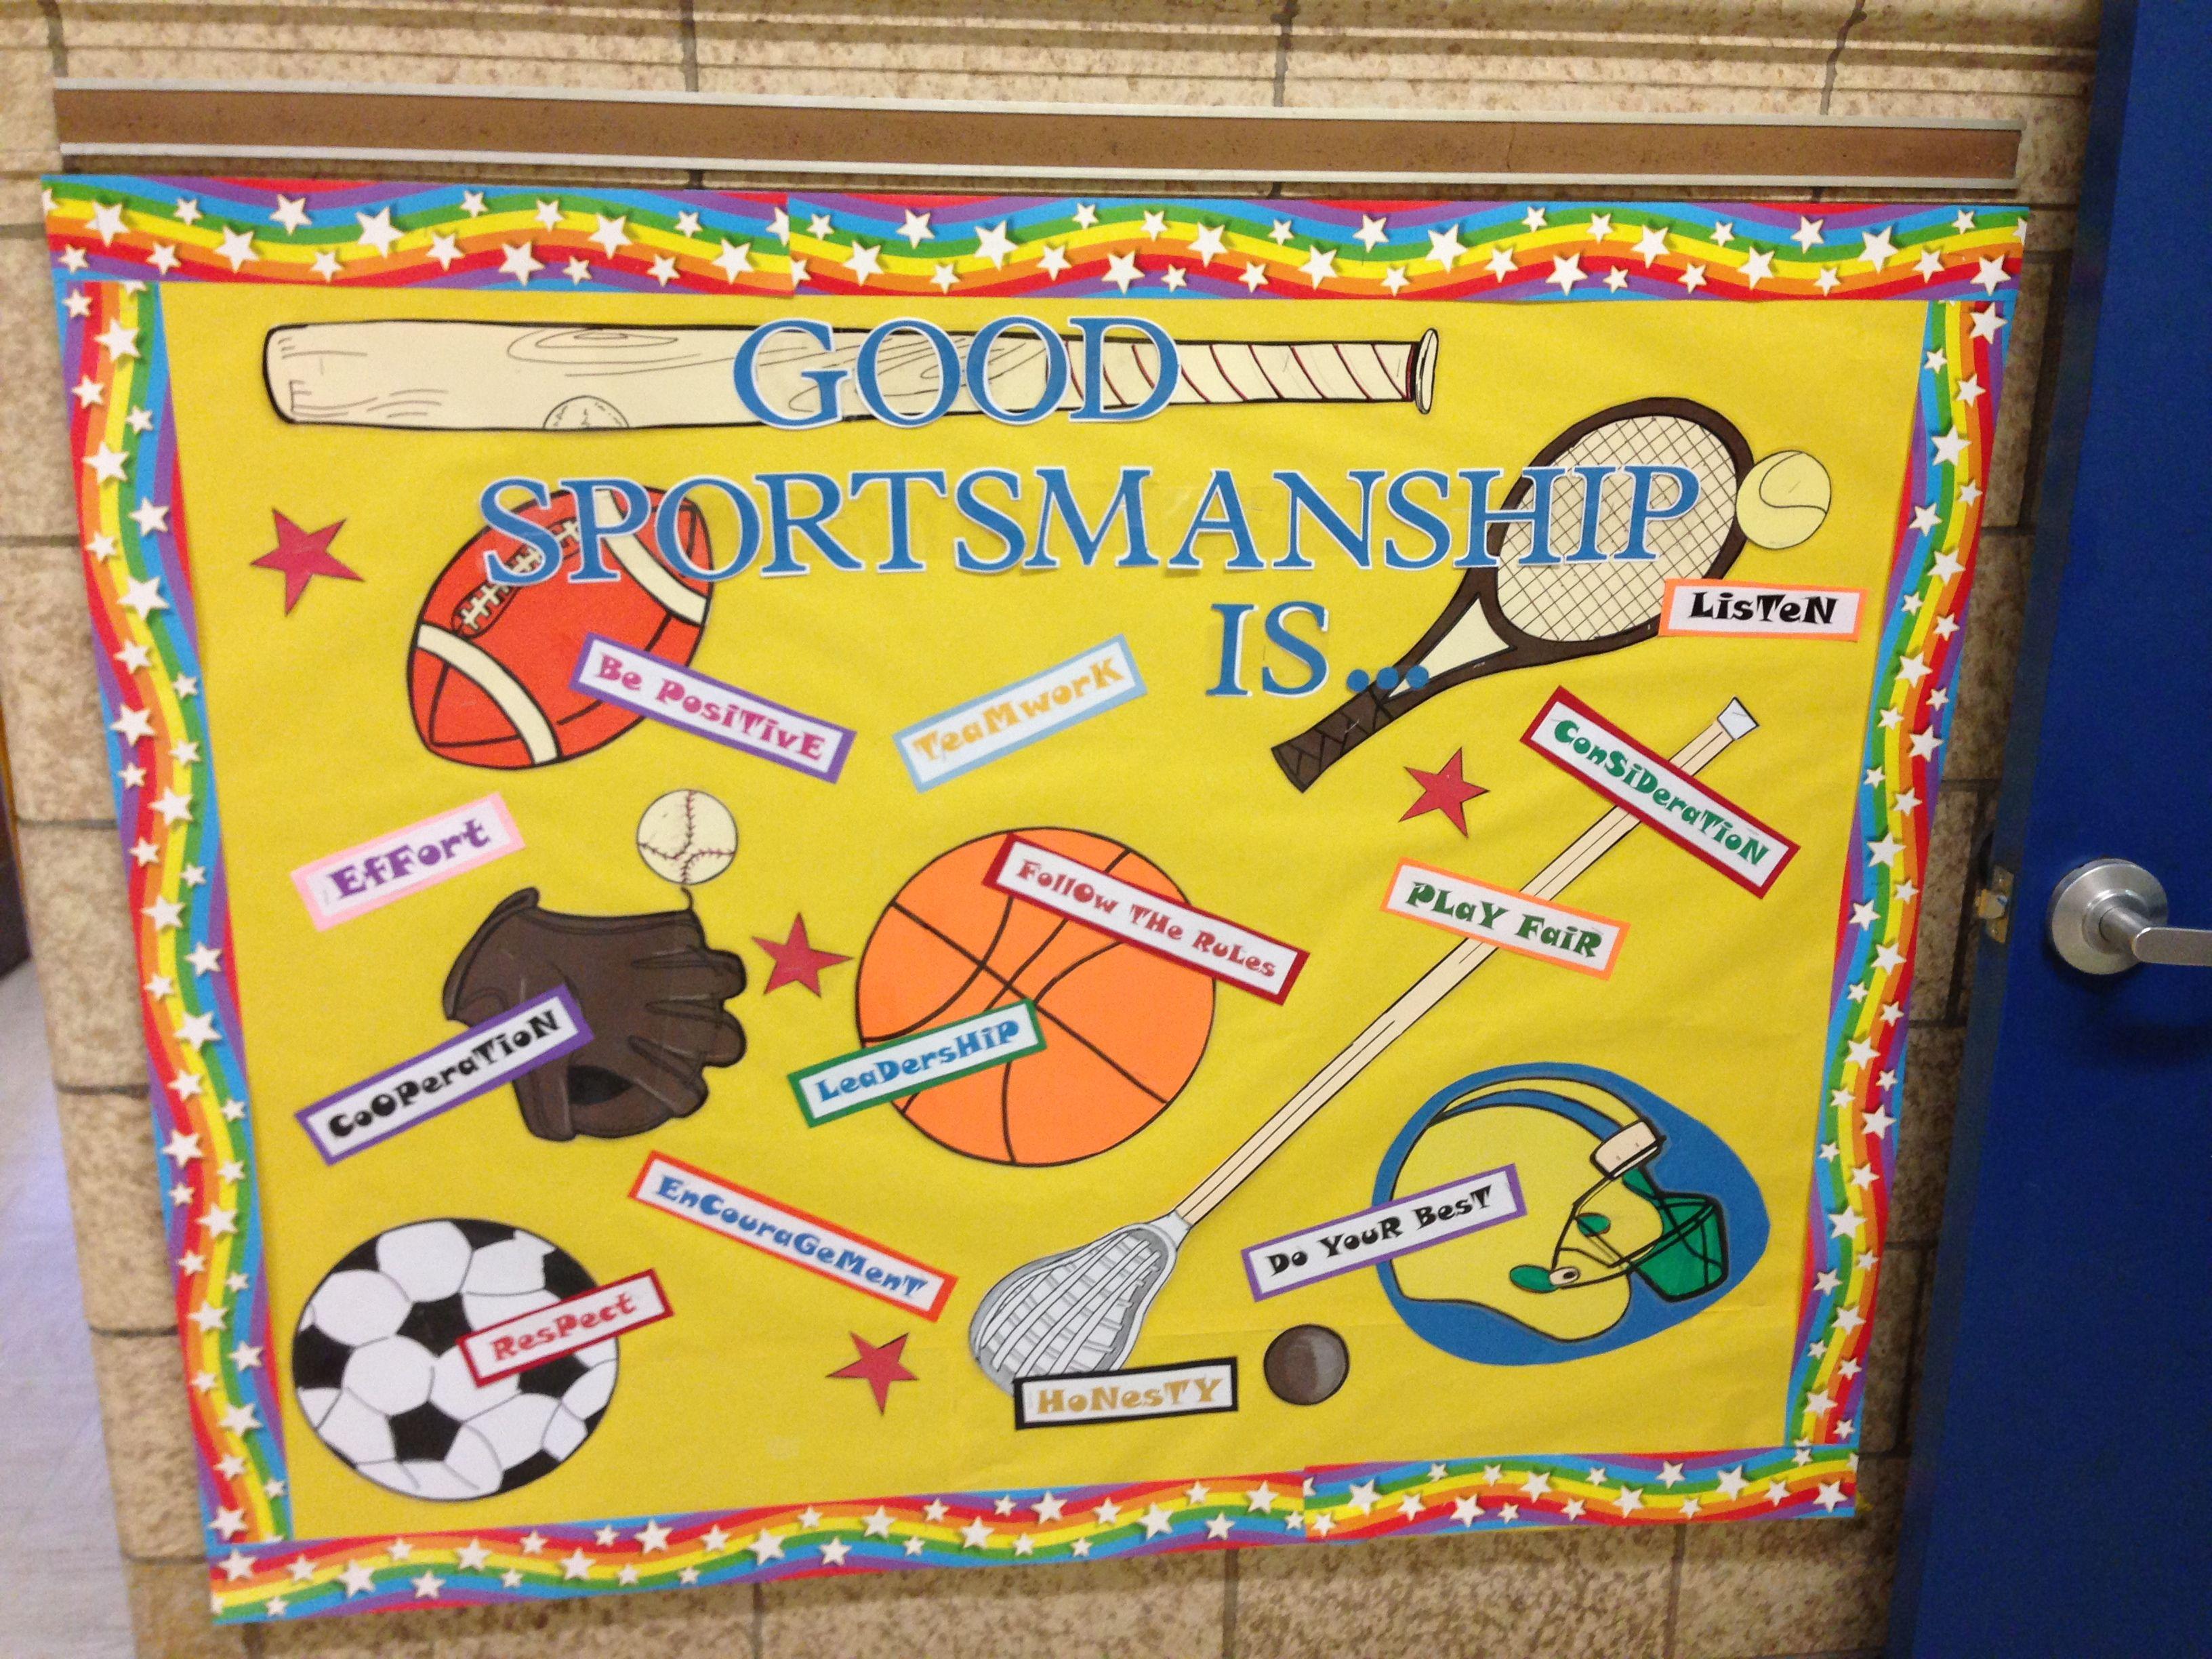 Teamwork Sportsmanship Physical Education Bulletin Board